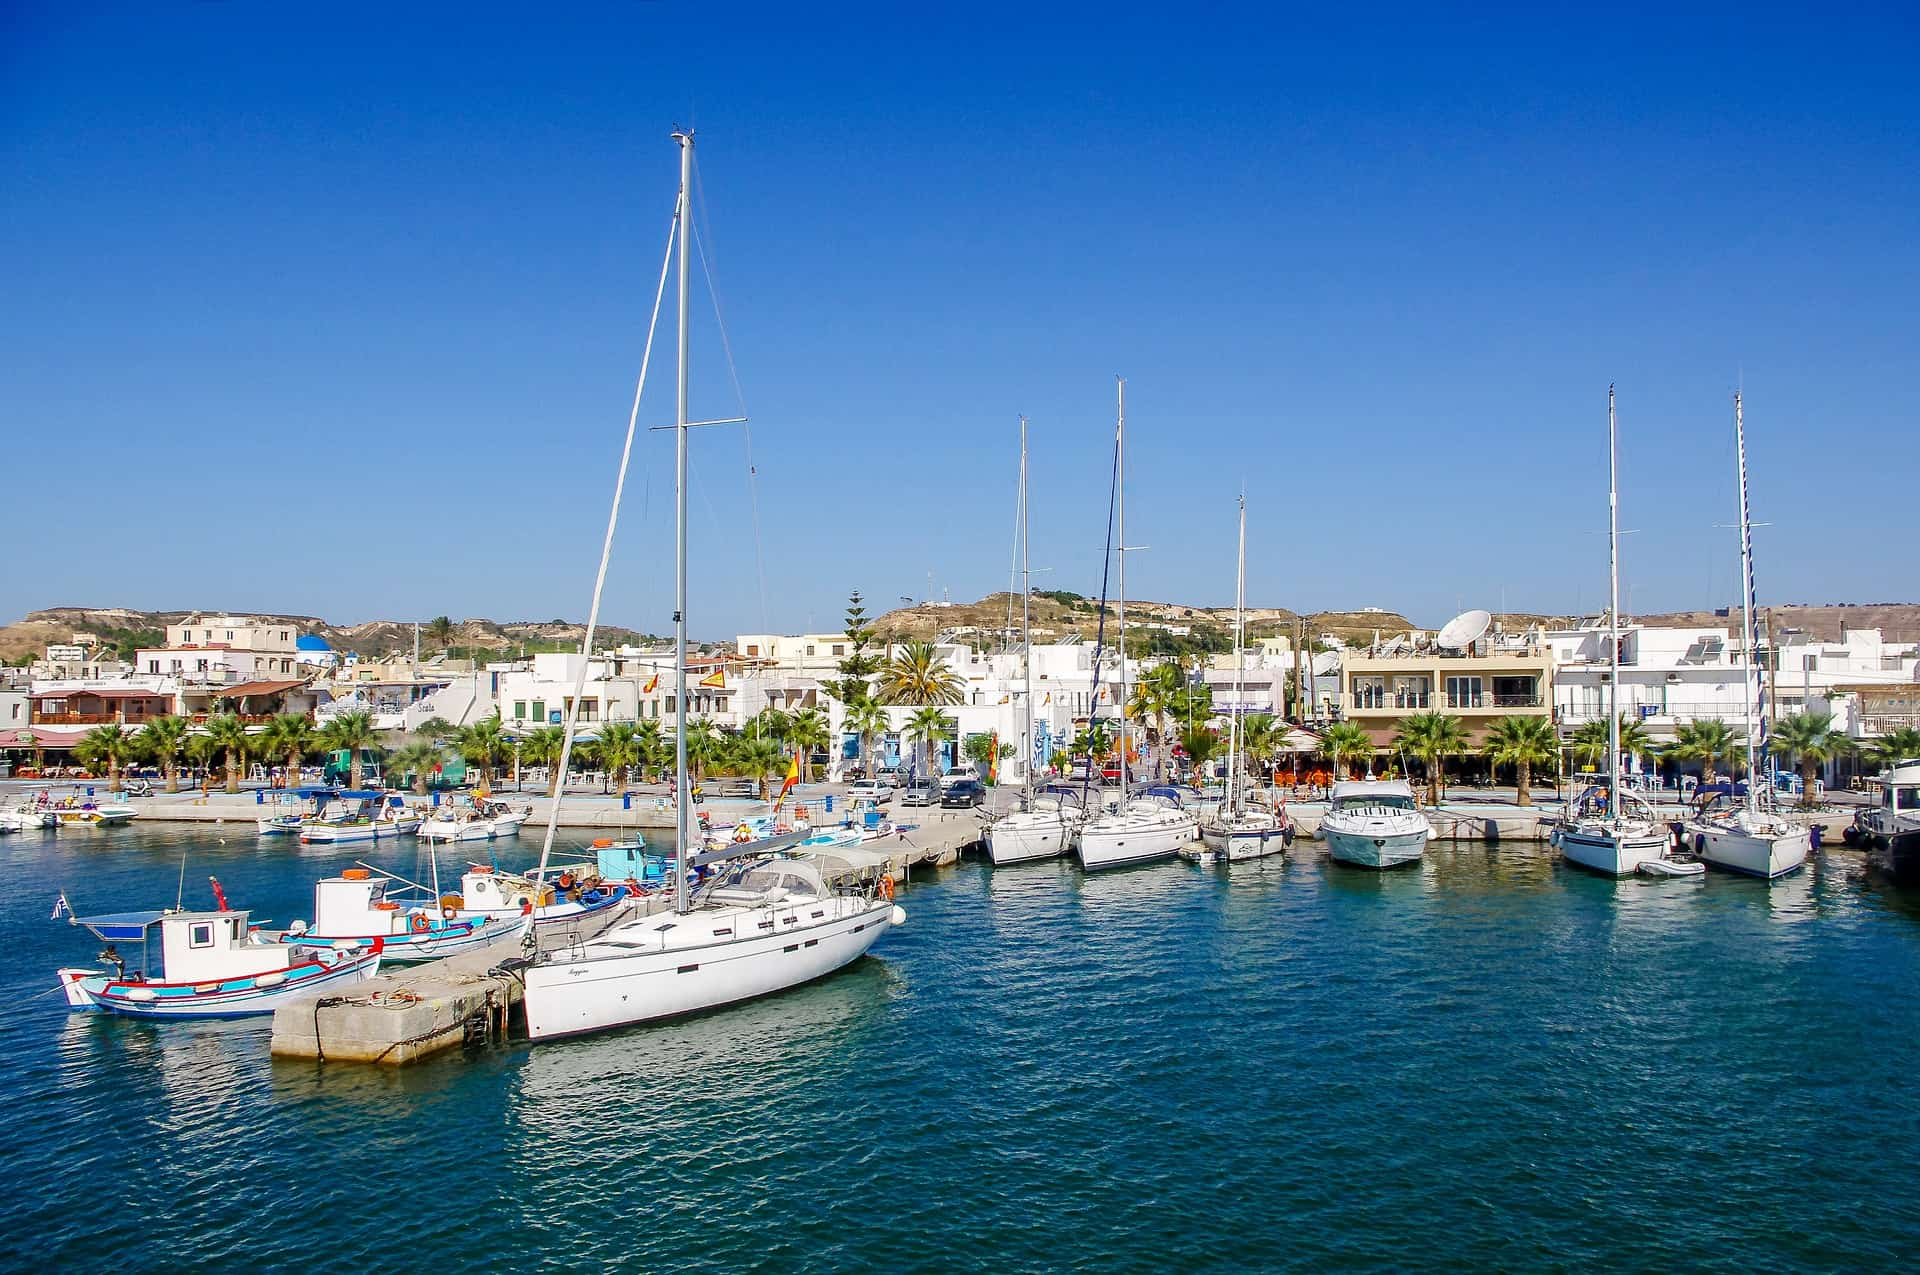 Städtereisen Kos Stadt nur 151,00€ - 4 Nächte Kos Insel Urlaub